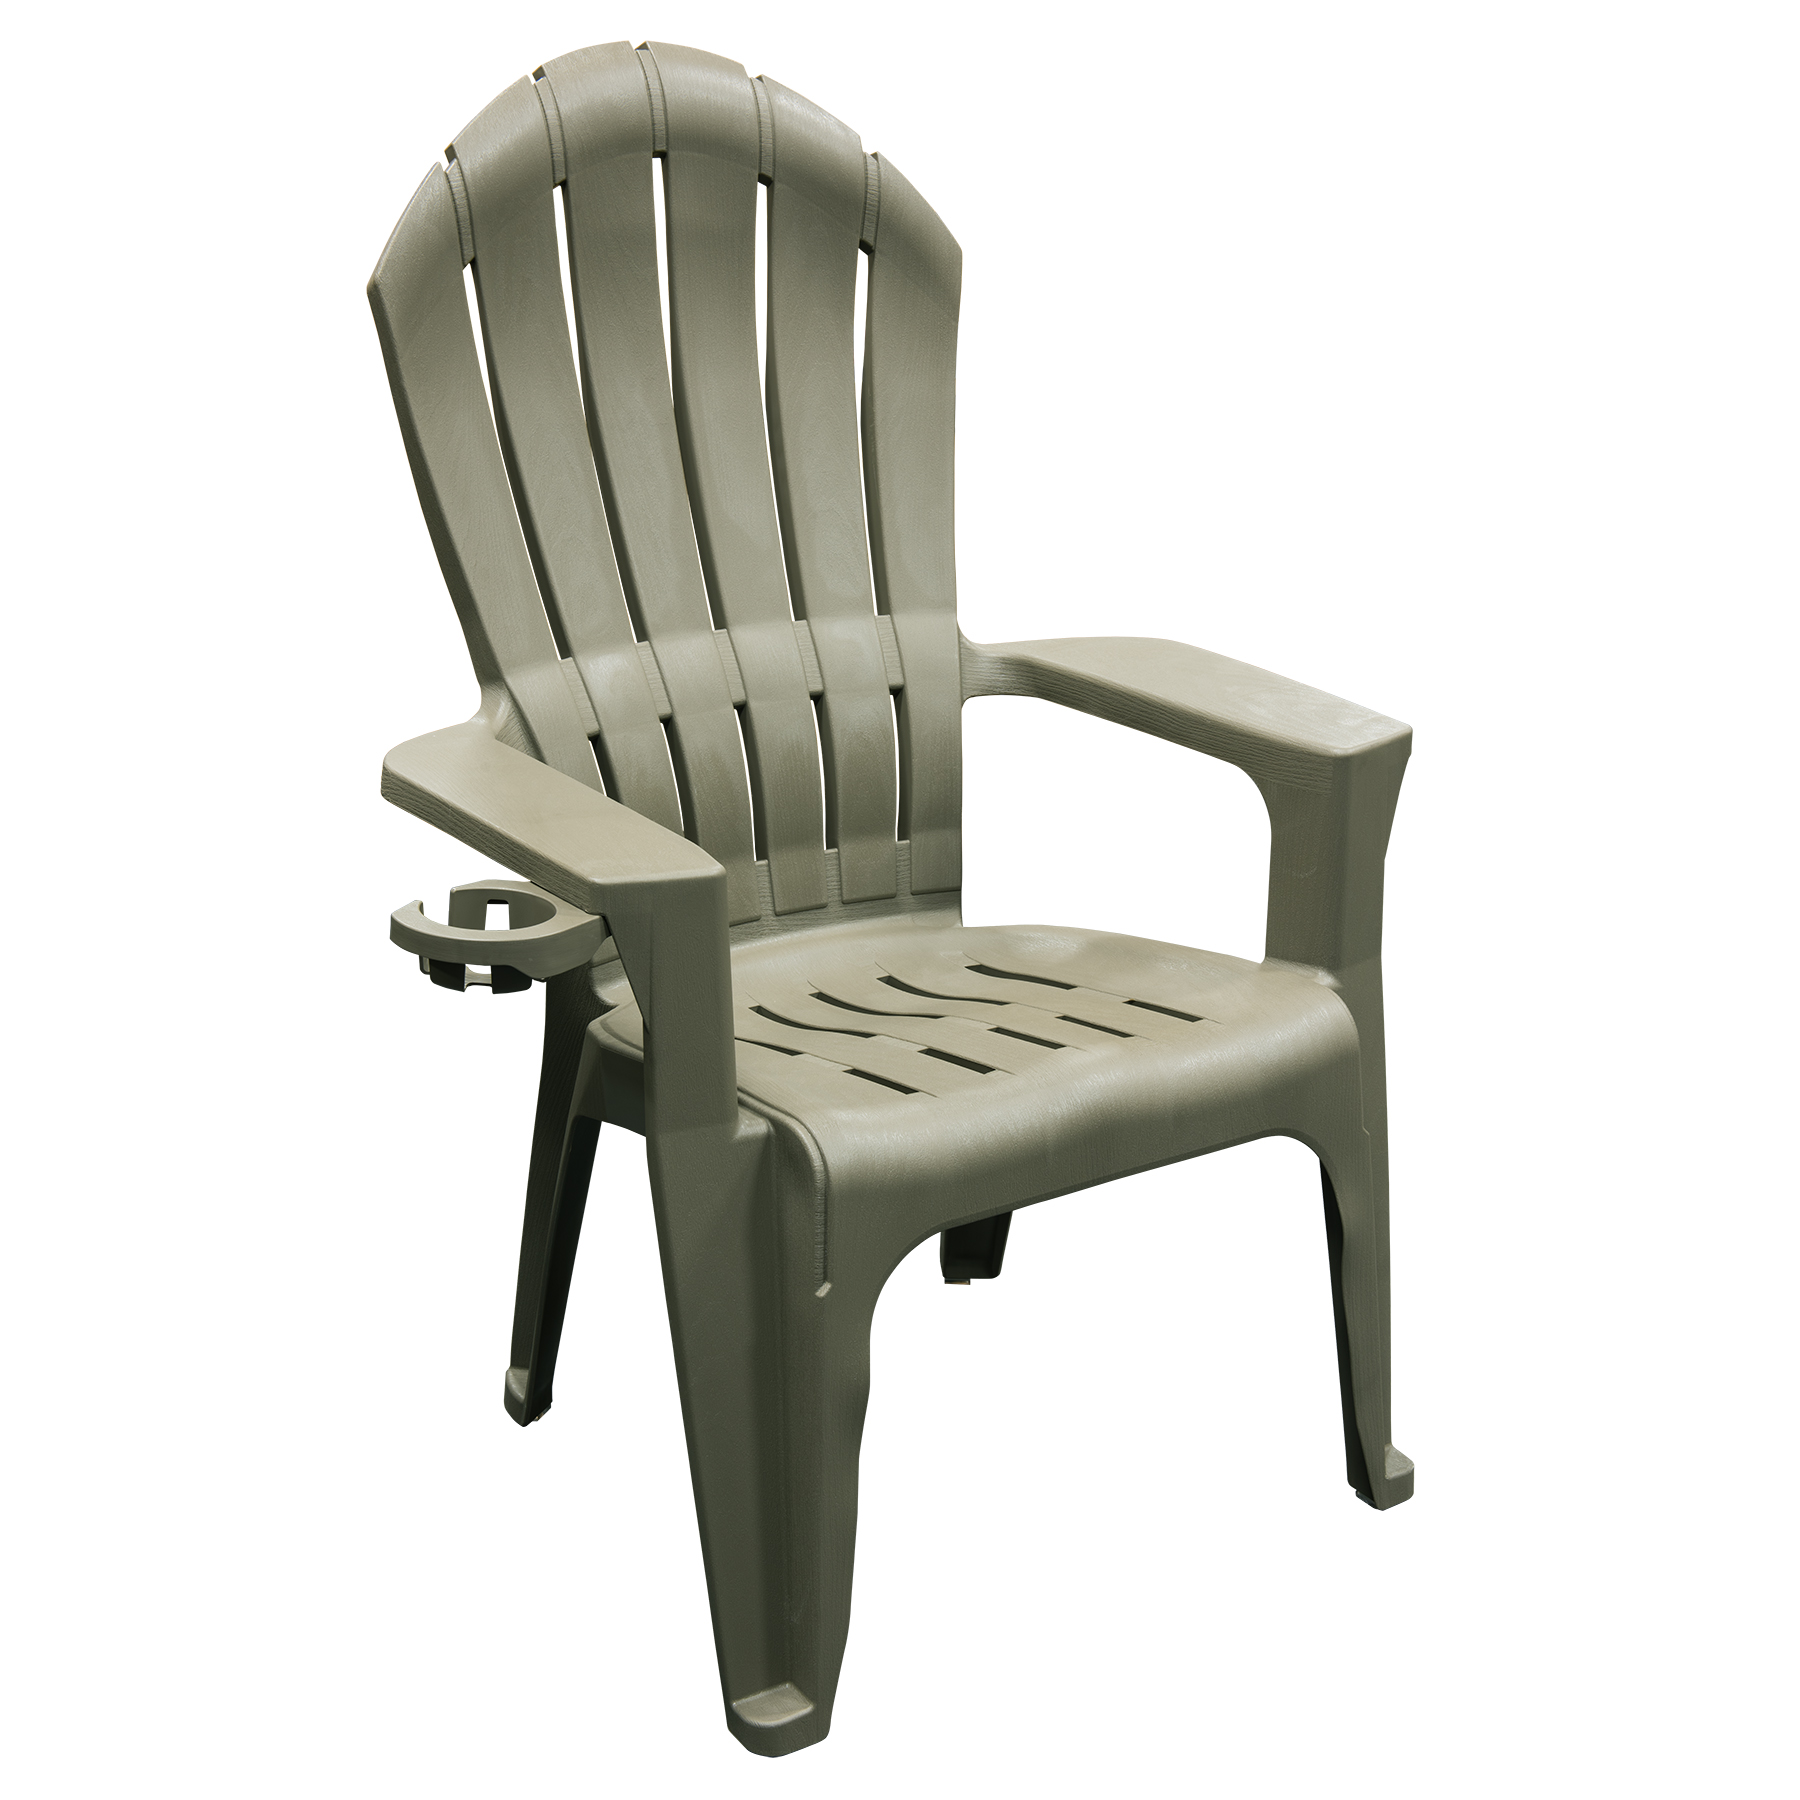 Adams Mfg Corp Big Easy Adirondack Chair - Gray